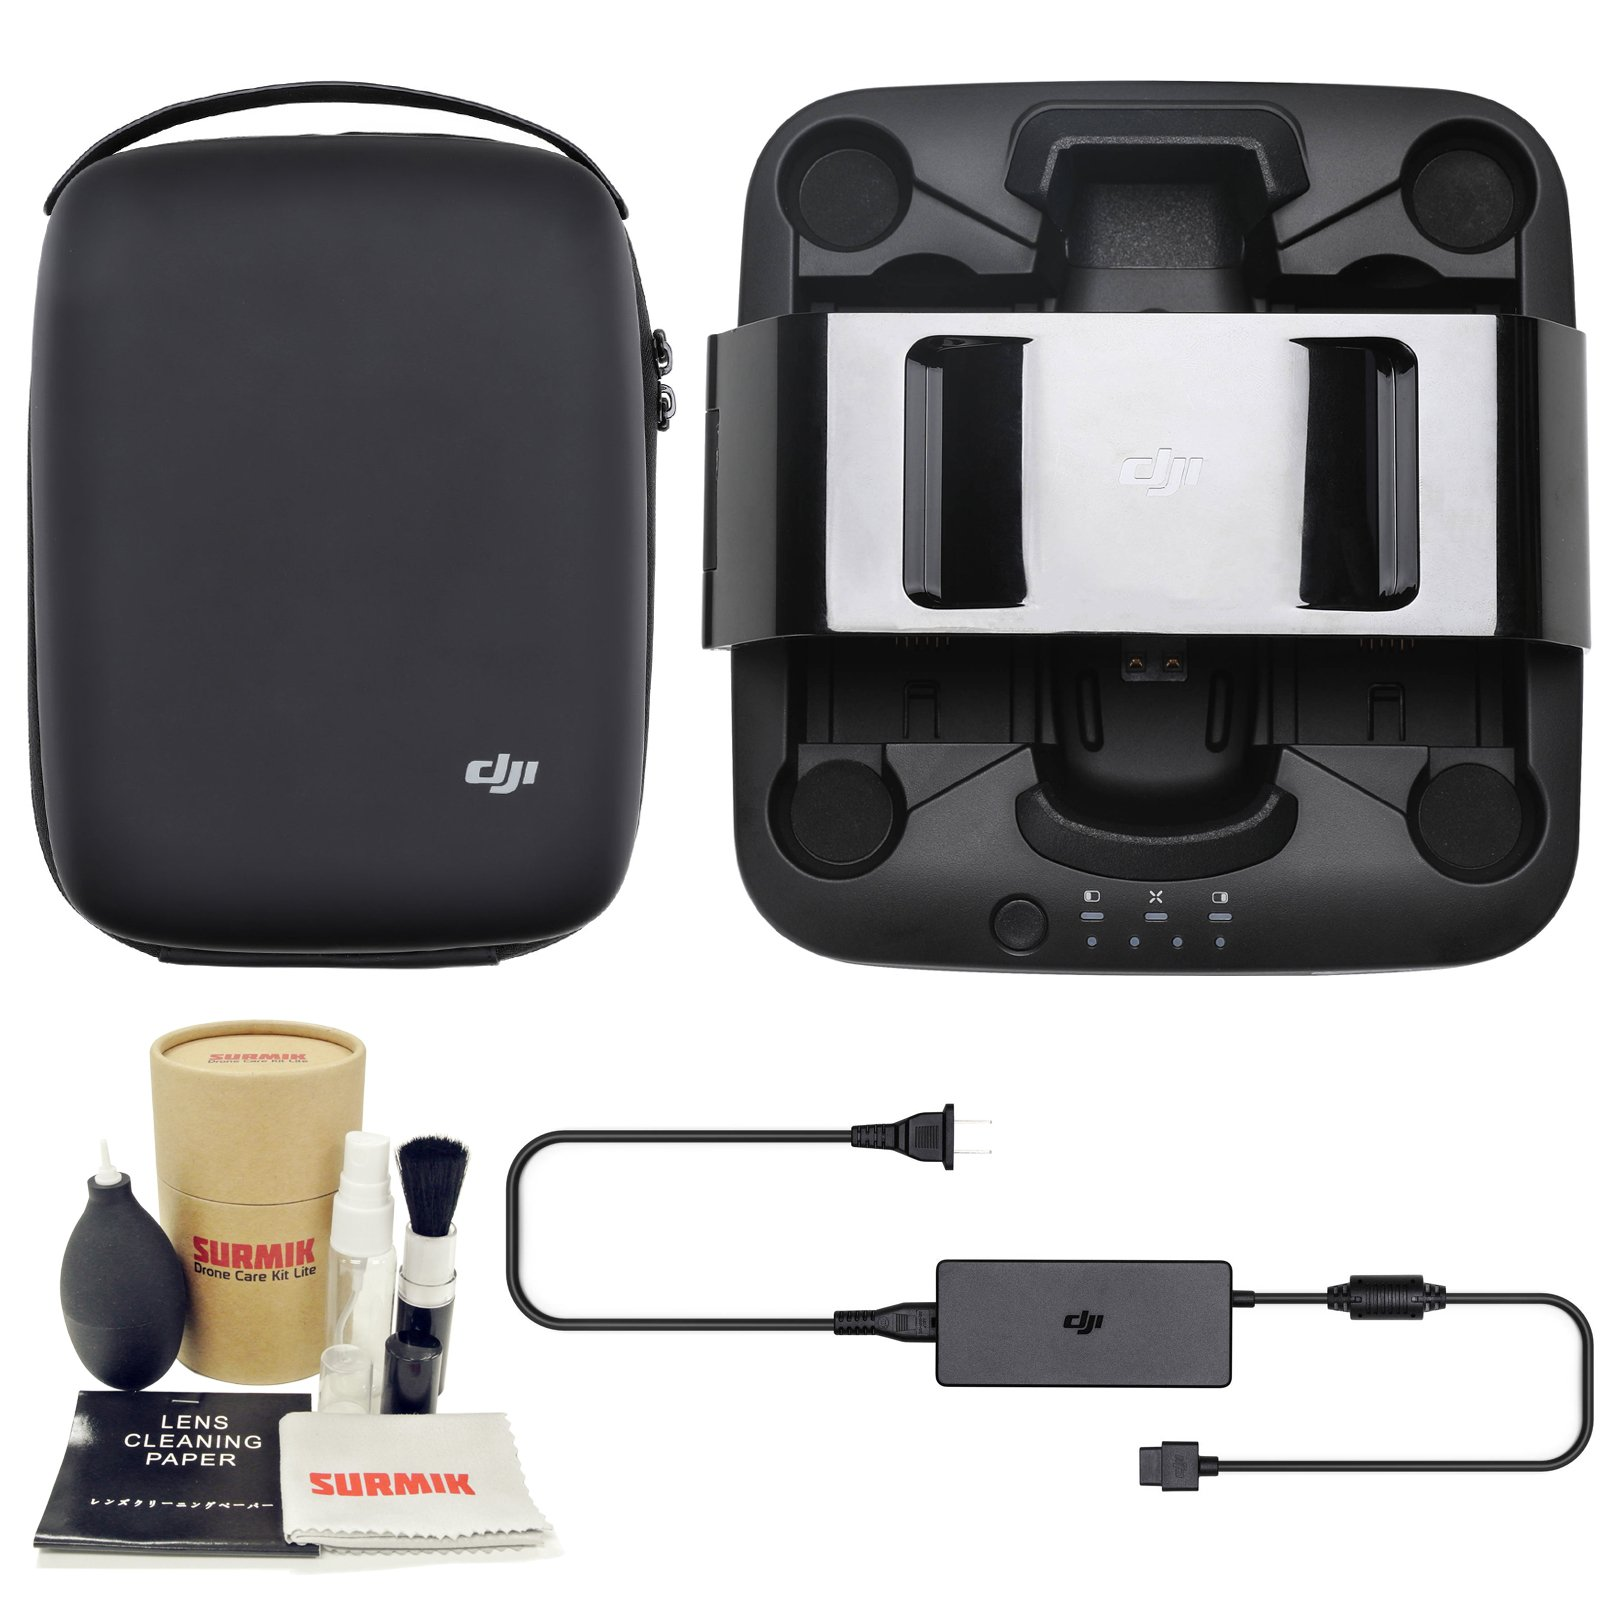 DJI Spark Portable Charging Station Bundle with Charging Station Bag Case and Surmik Drone Care Kit